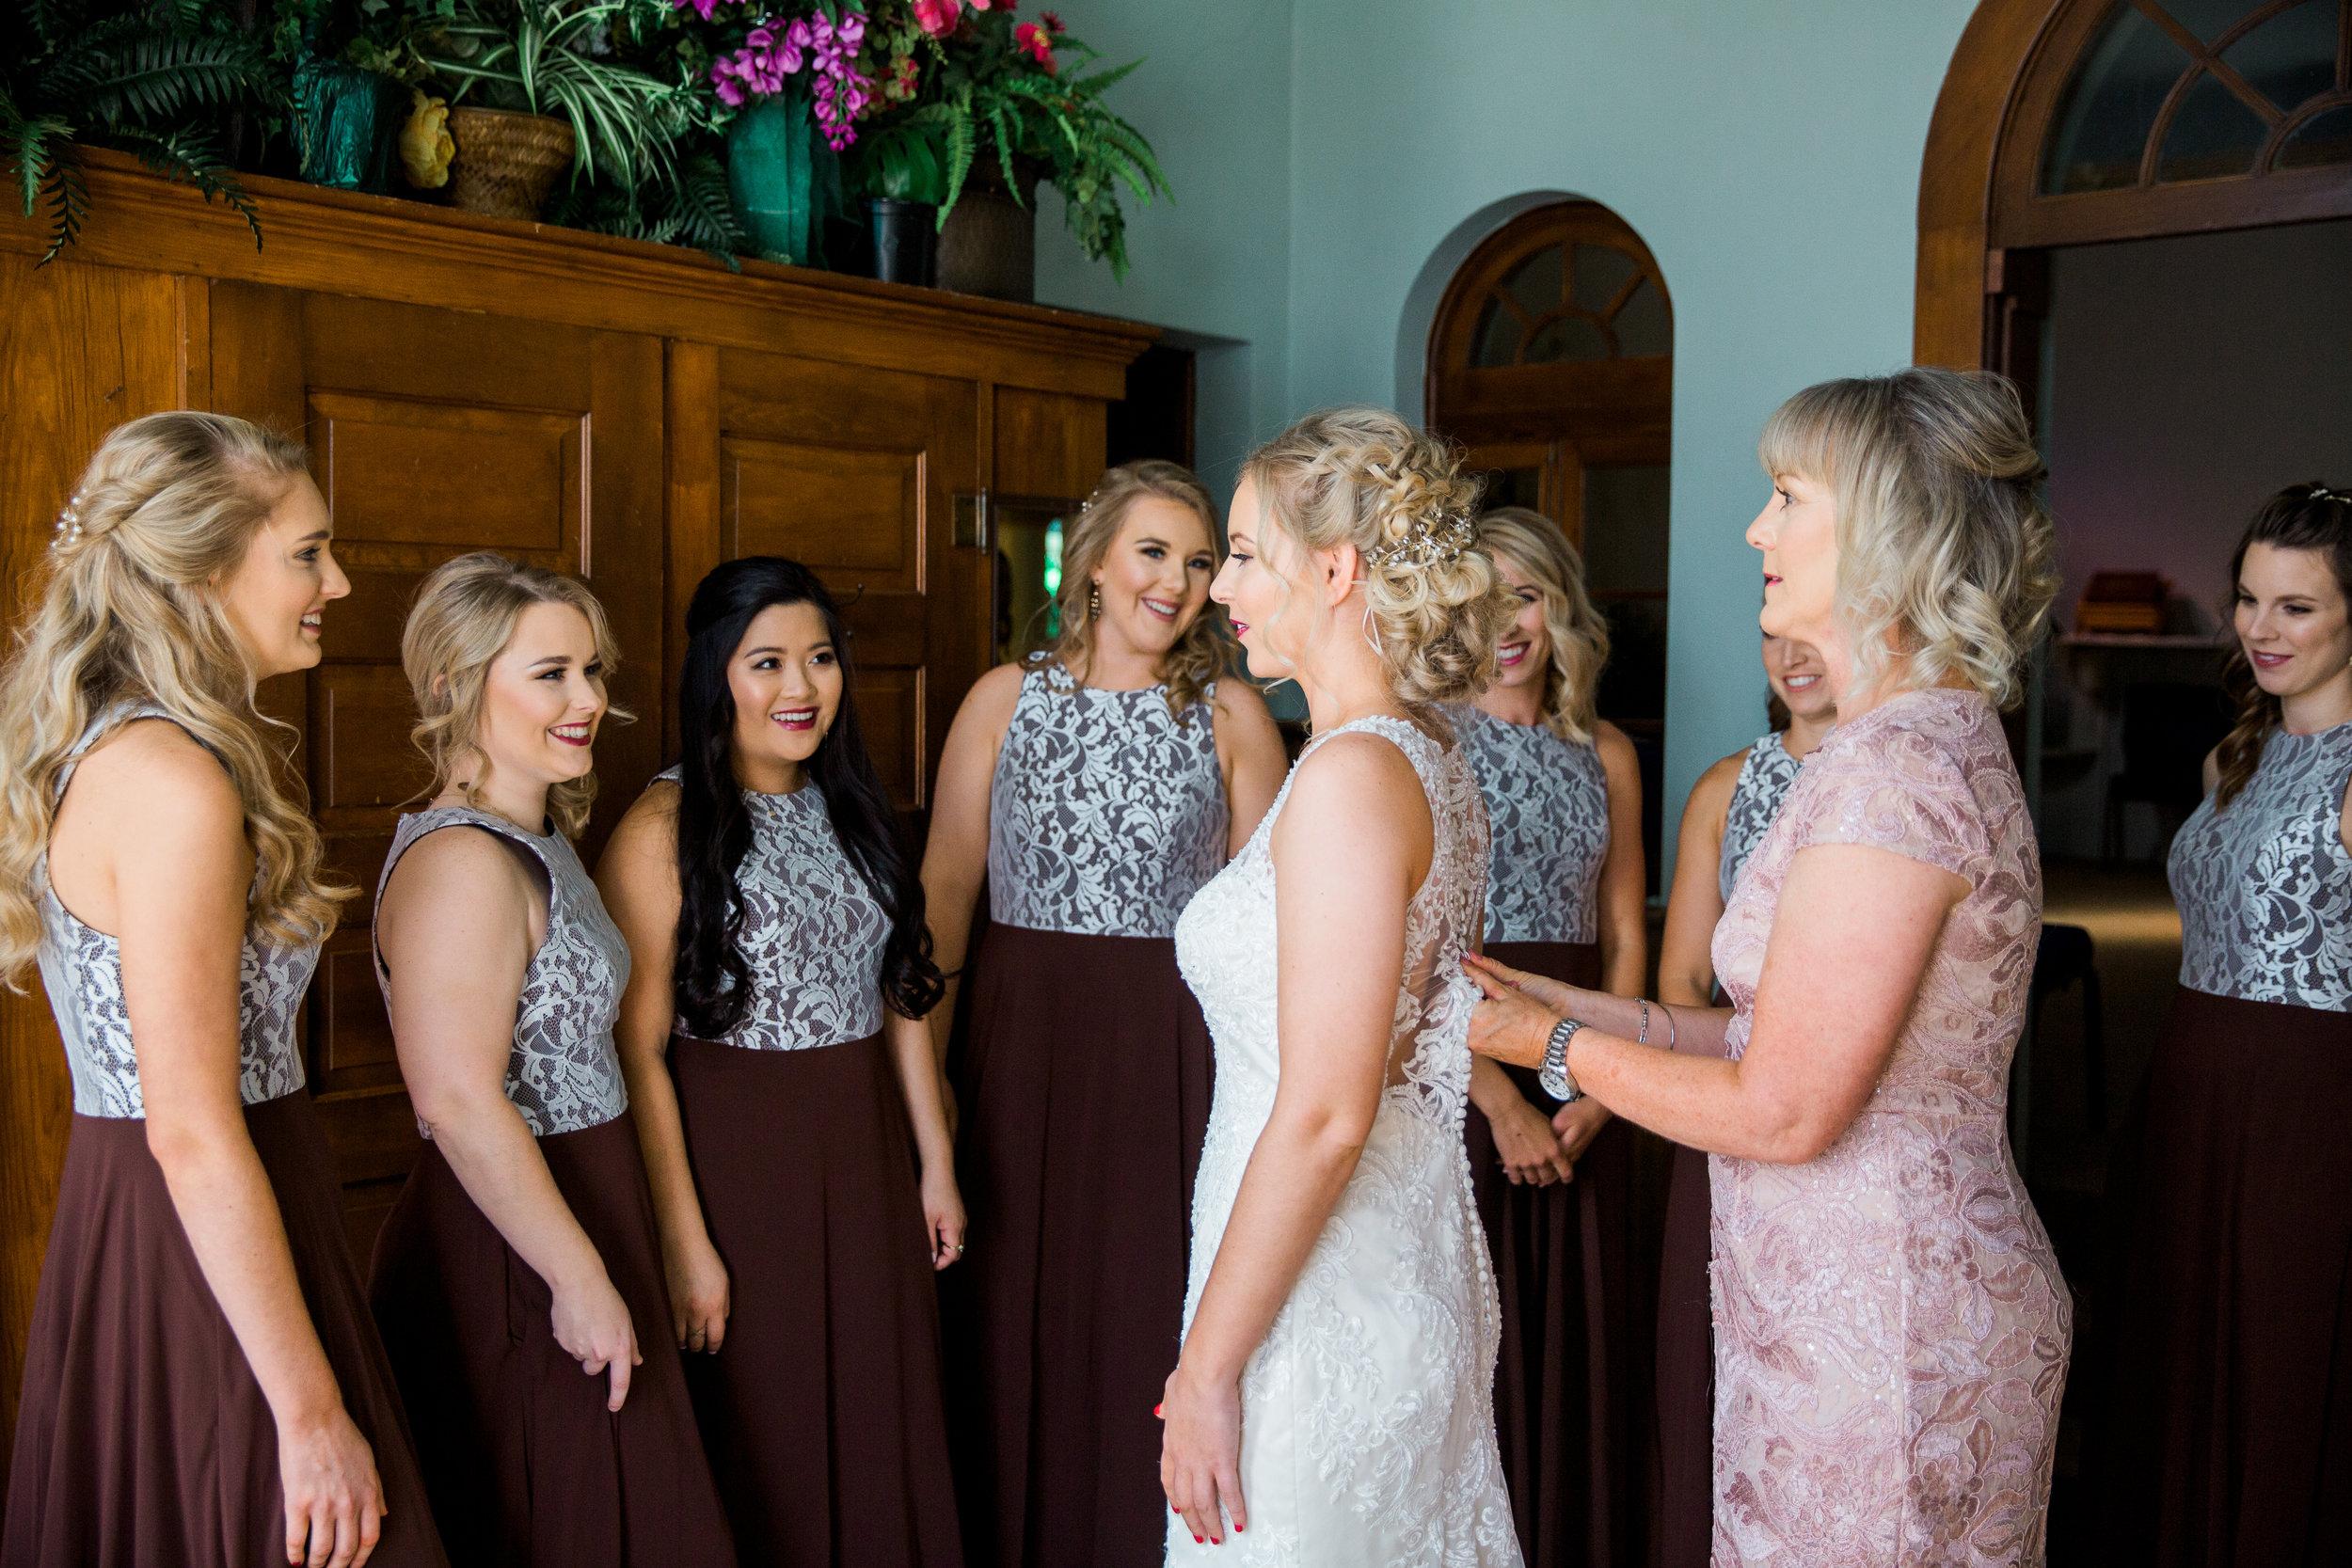 Bailey-Nathan-Windthorst-Texas-Wedding-014.jpg